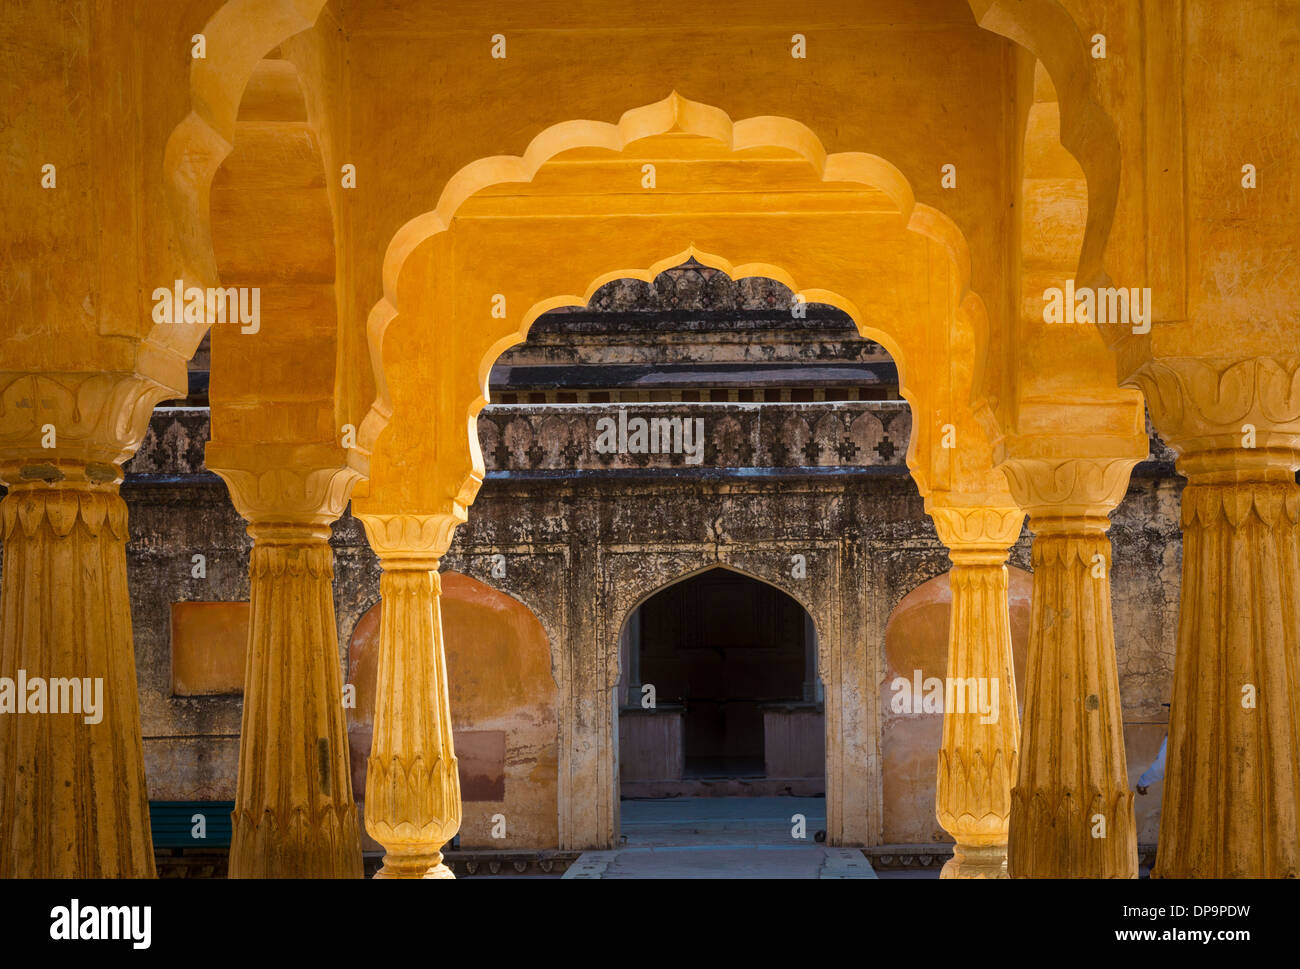 Amer Fort si trova in Amer 6,8 mi da Jaipur, stato del Rajasthan, India Immagini Stock